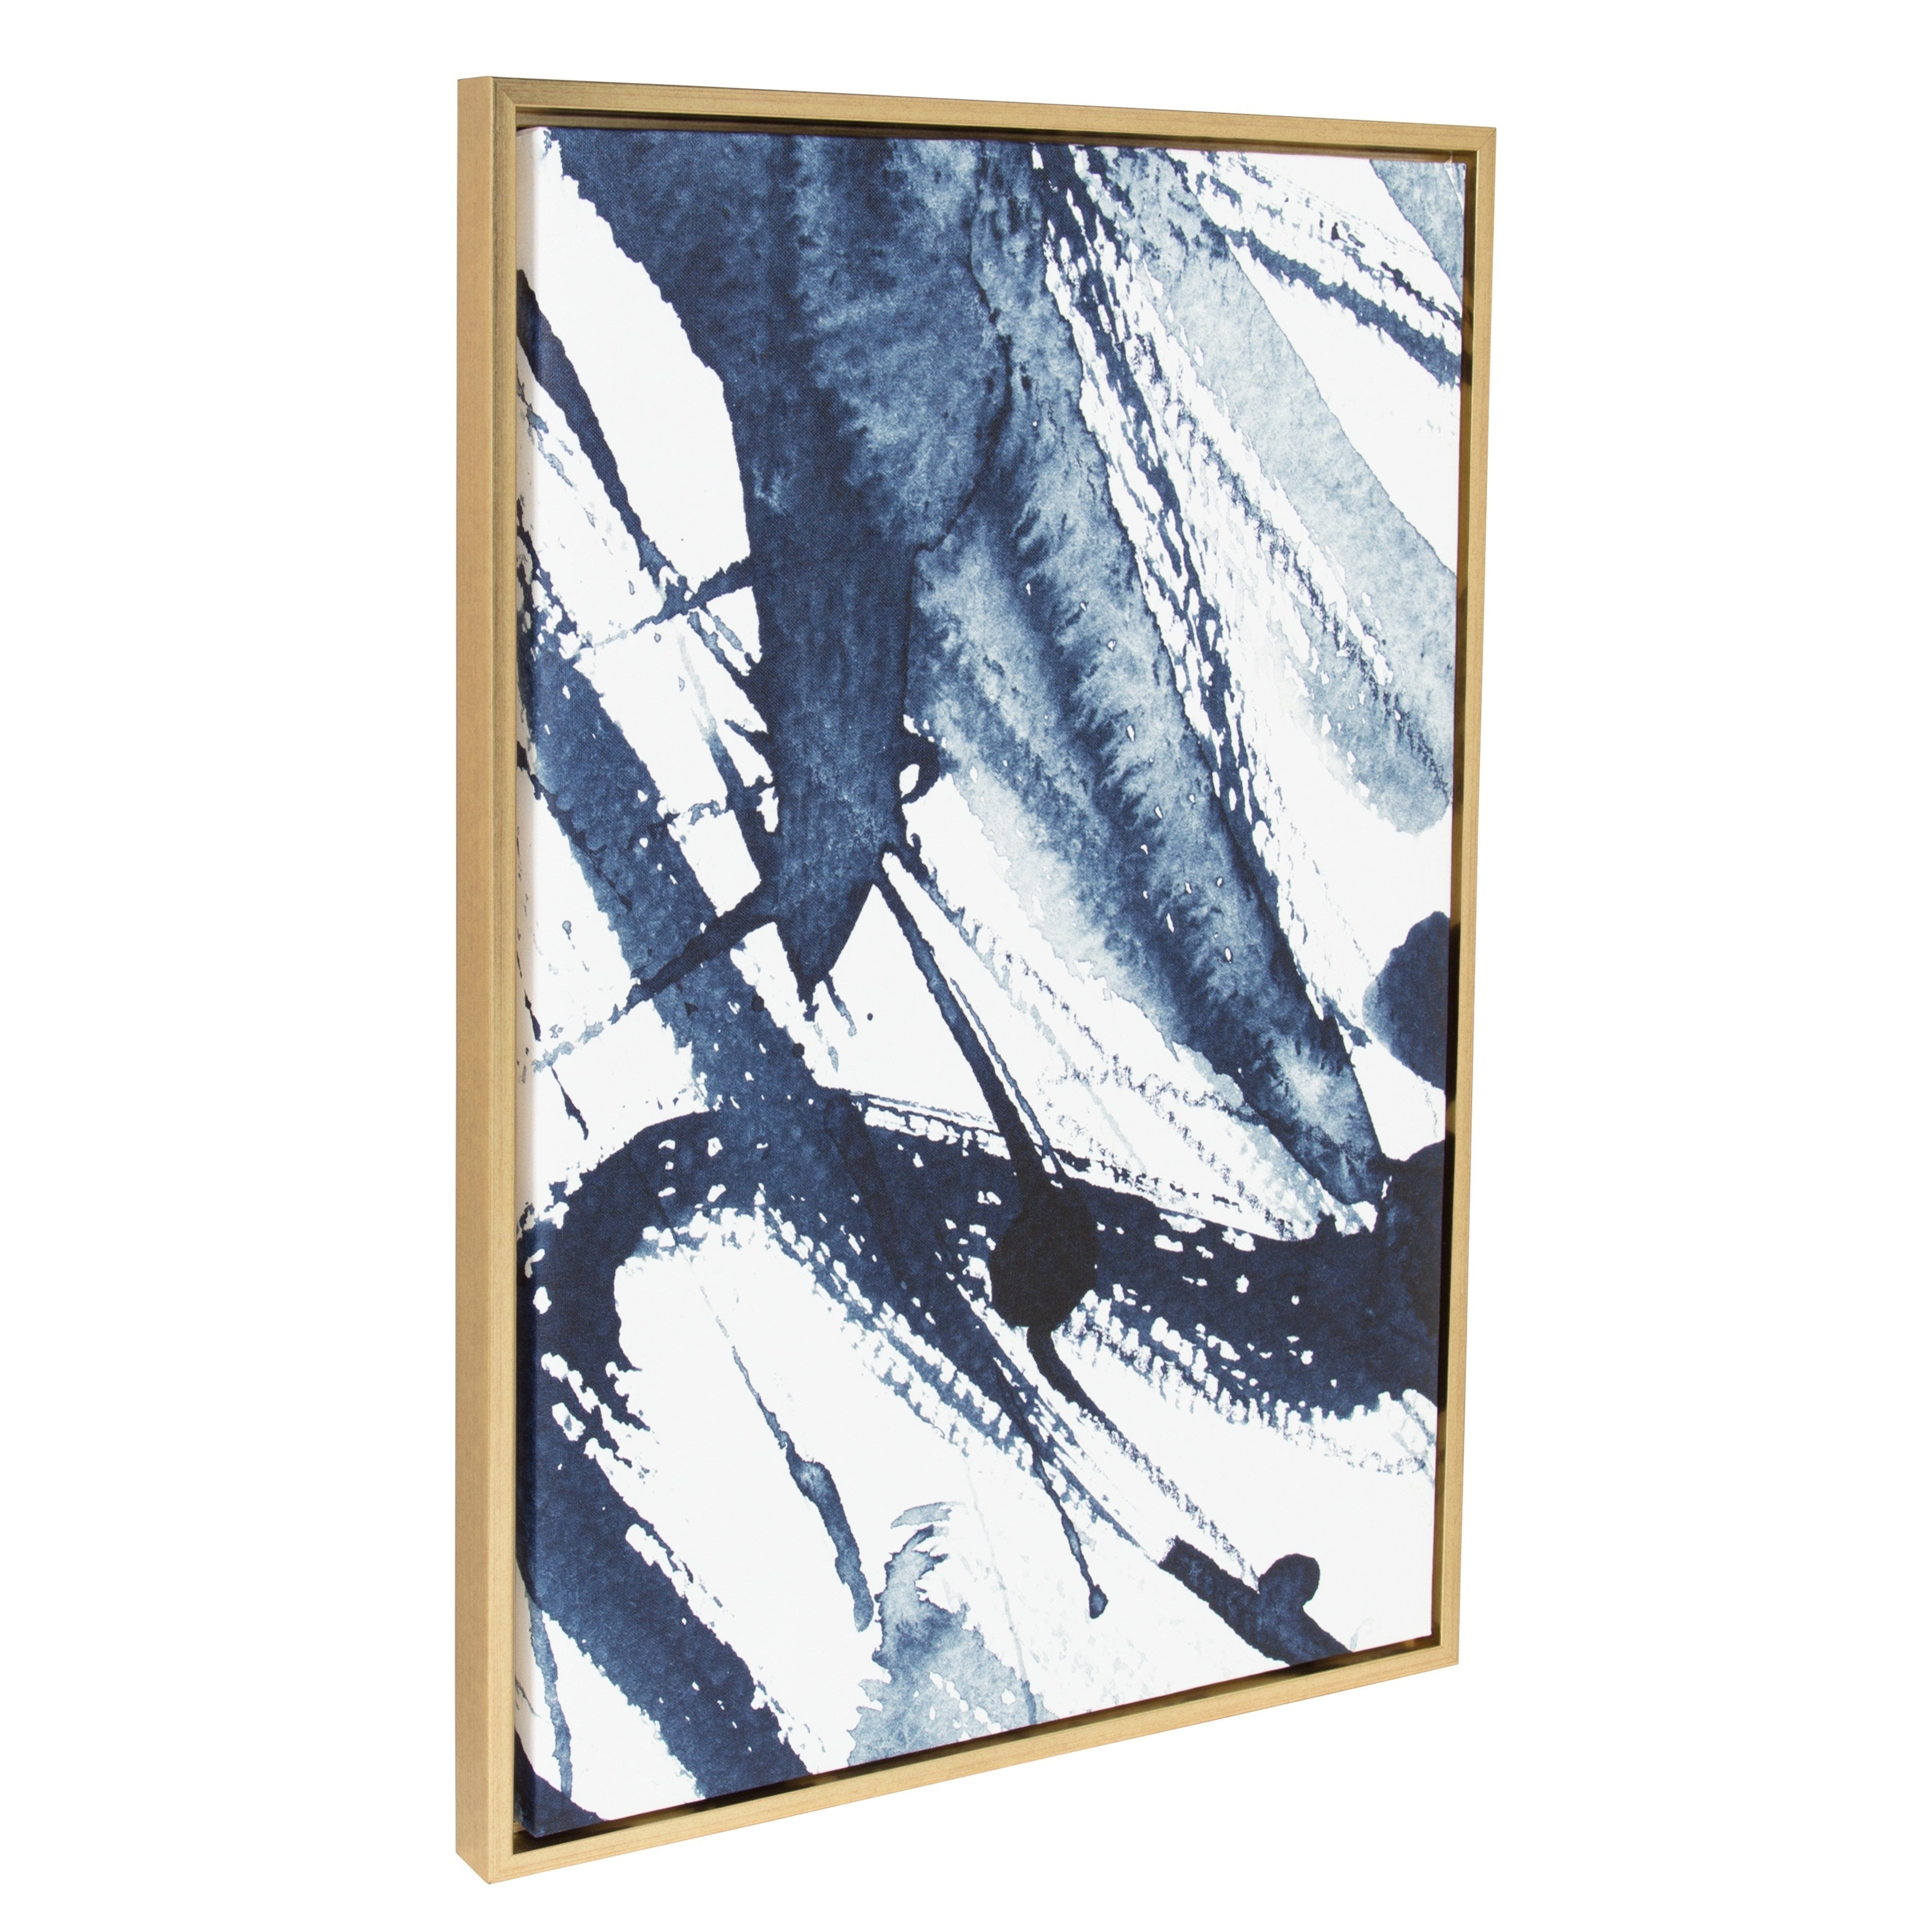 Shop Sylvie Indigo Watercolor Abstract Print Framed Canvas Wall Art ...